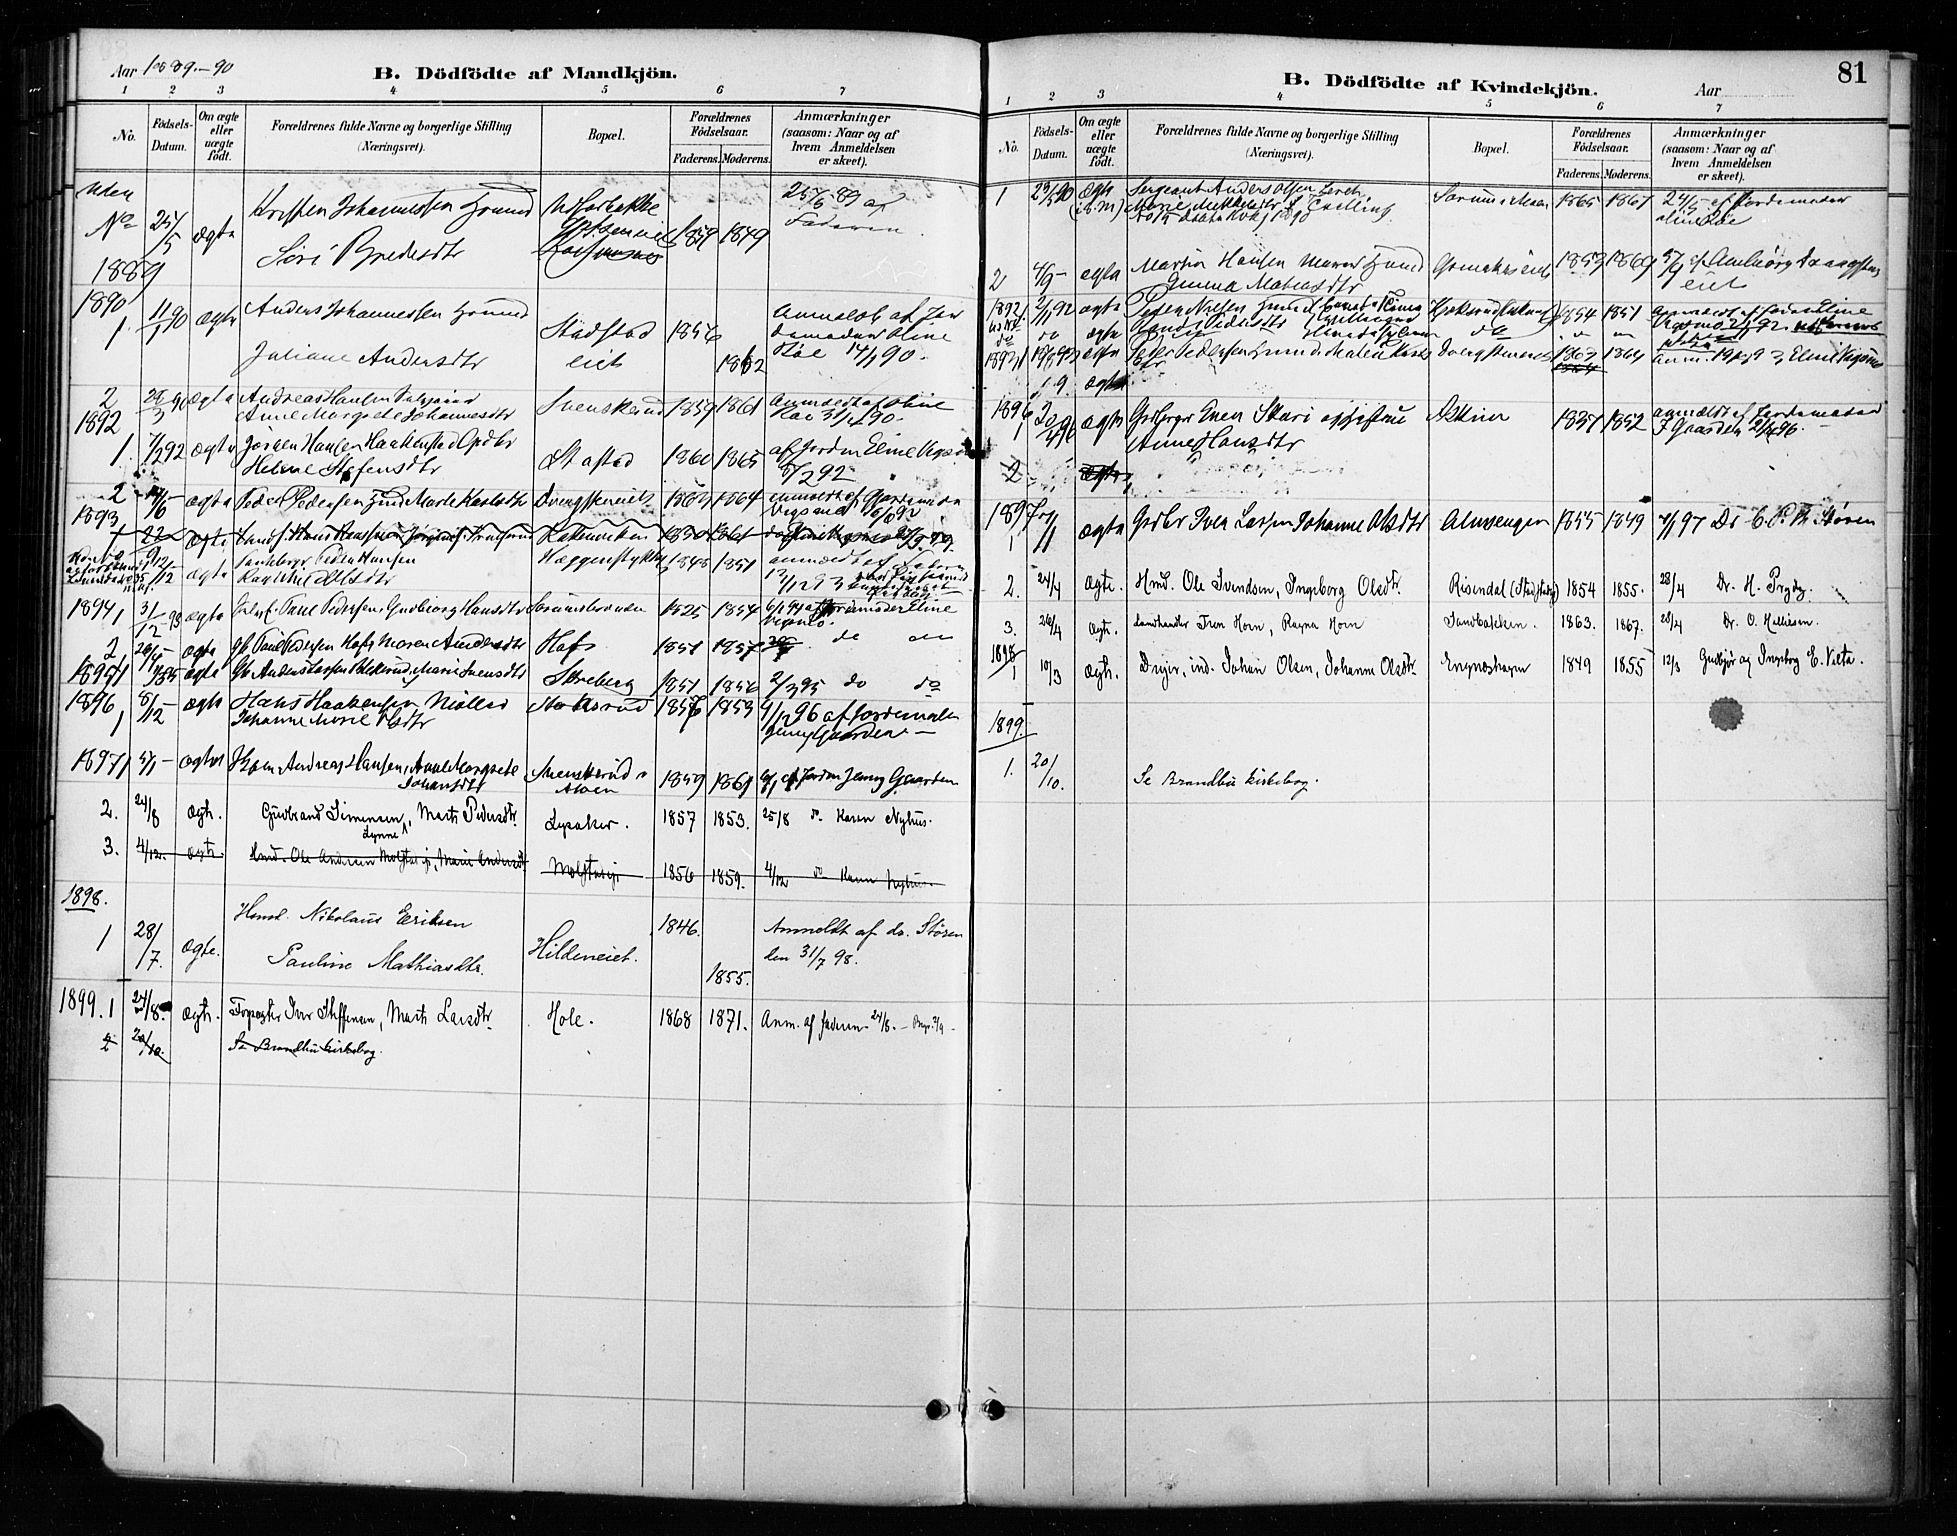 SAH, Gran prestekontor, Ministerialbok nr. 18, 1889-1899, s. 81